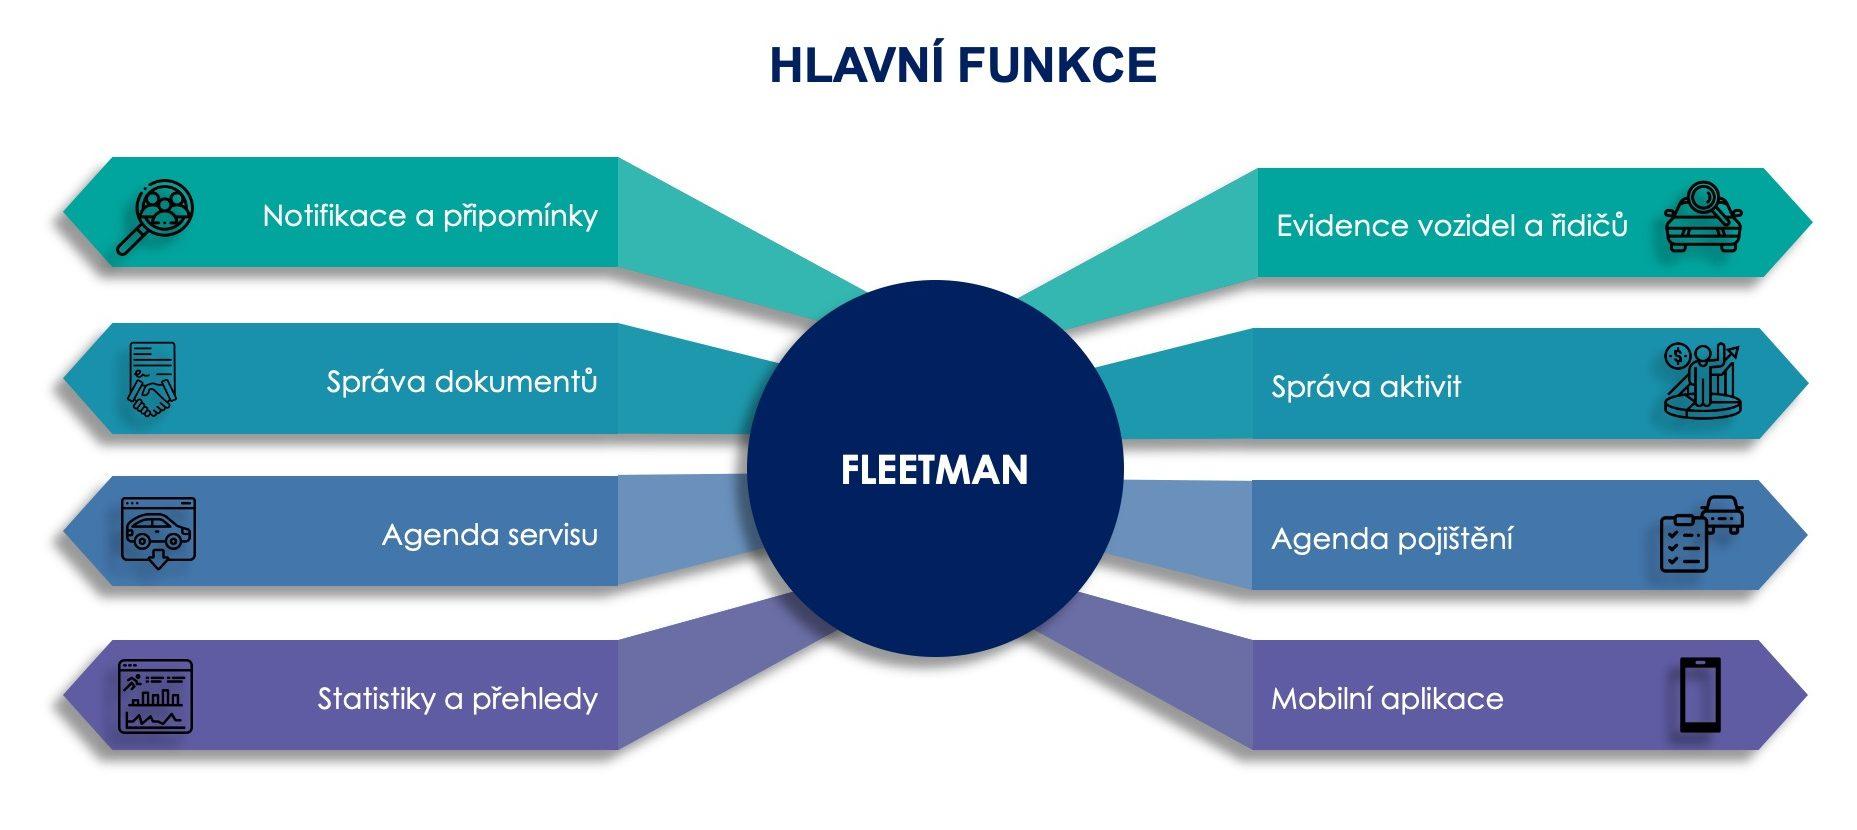 Fleetman - hlavní funkce